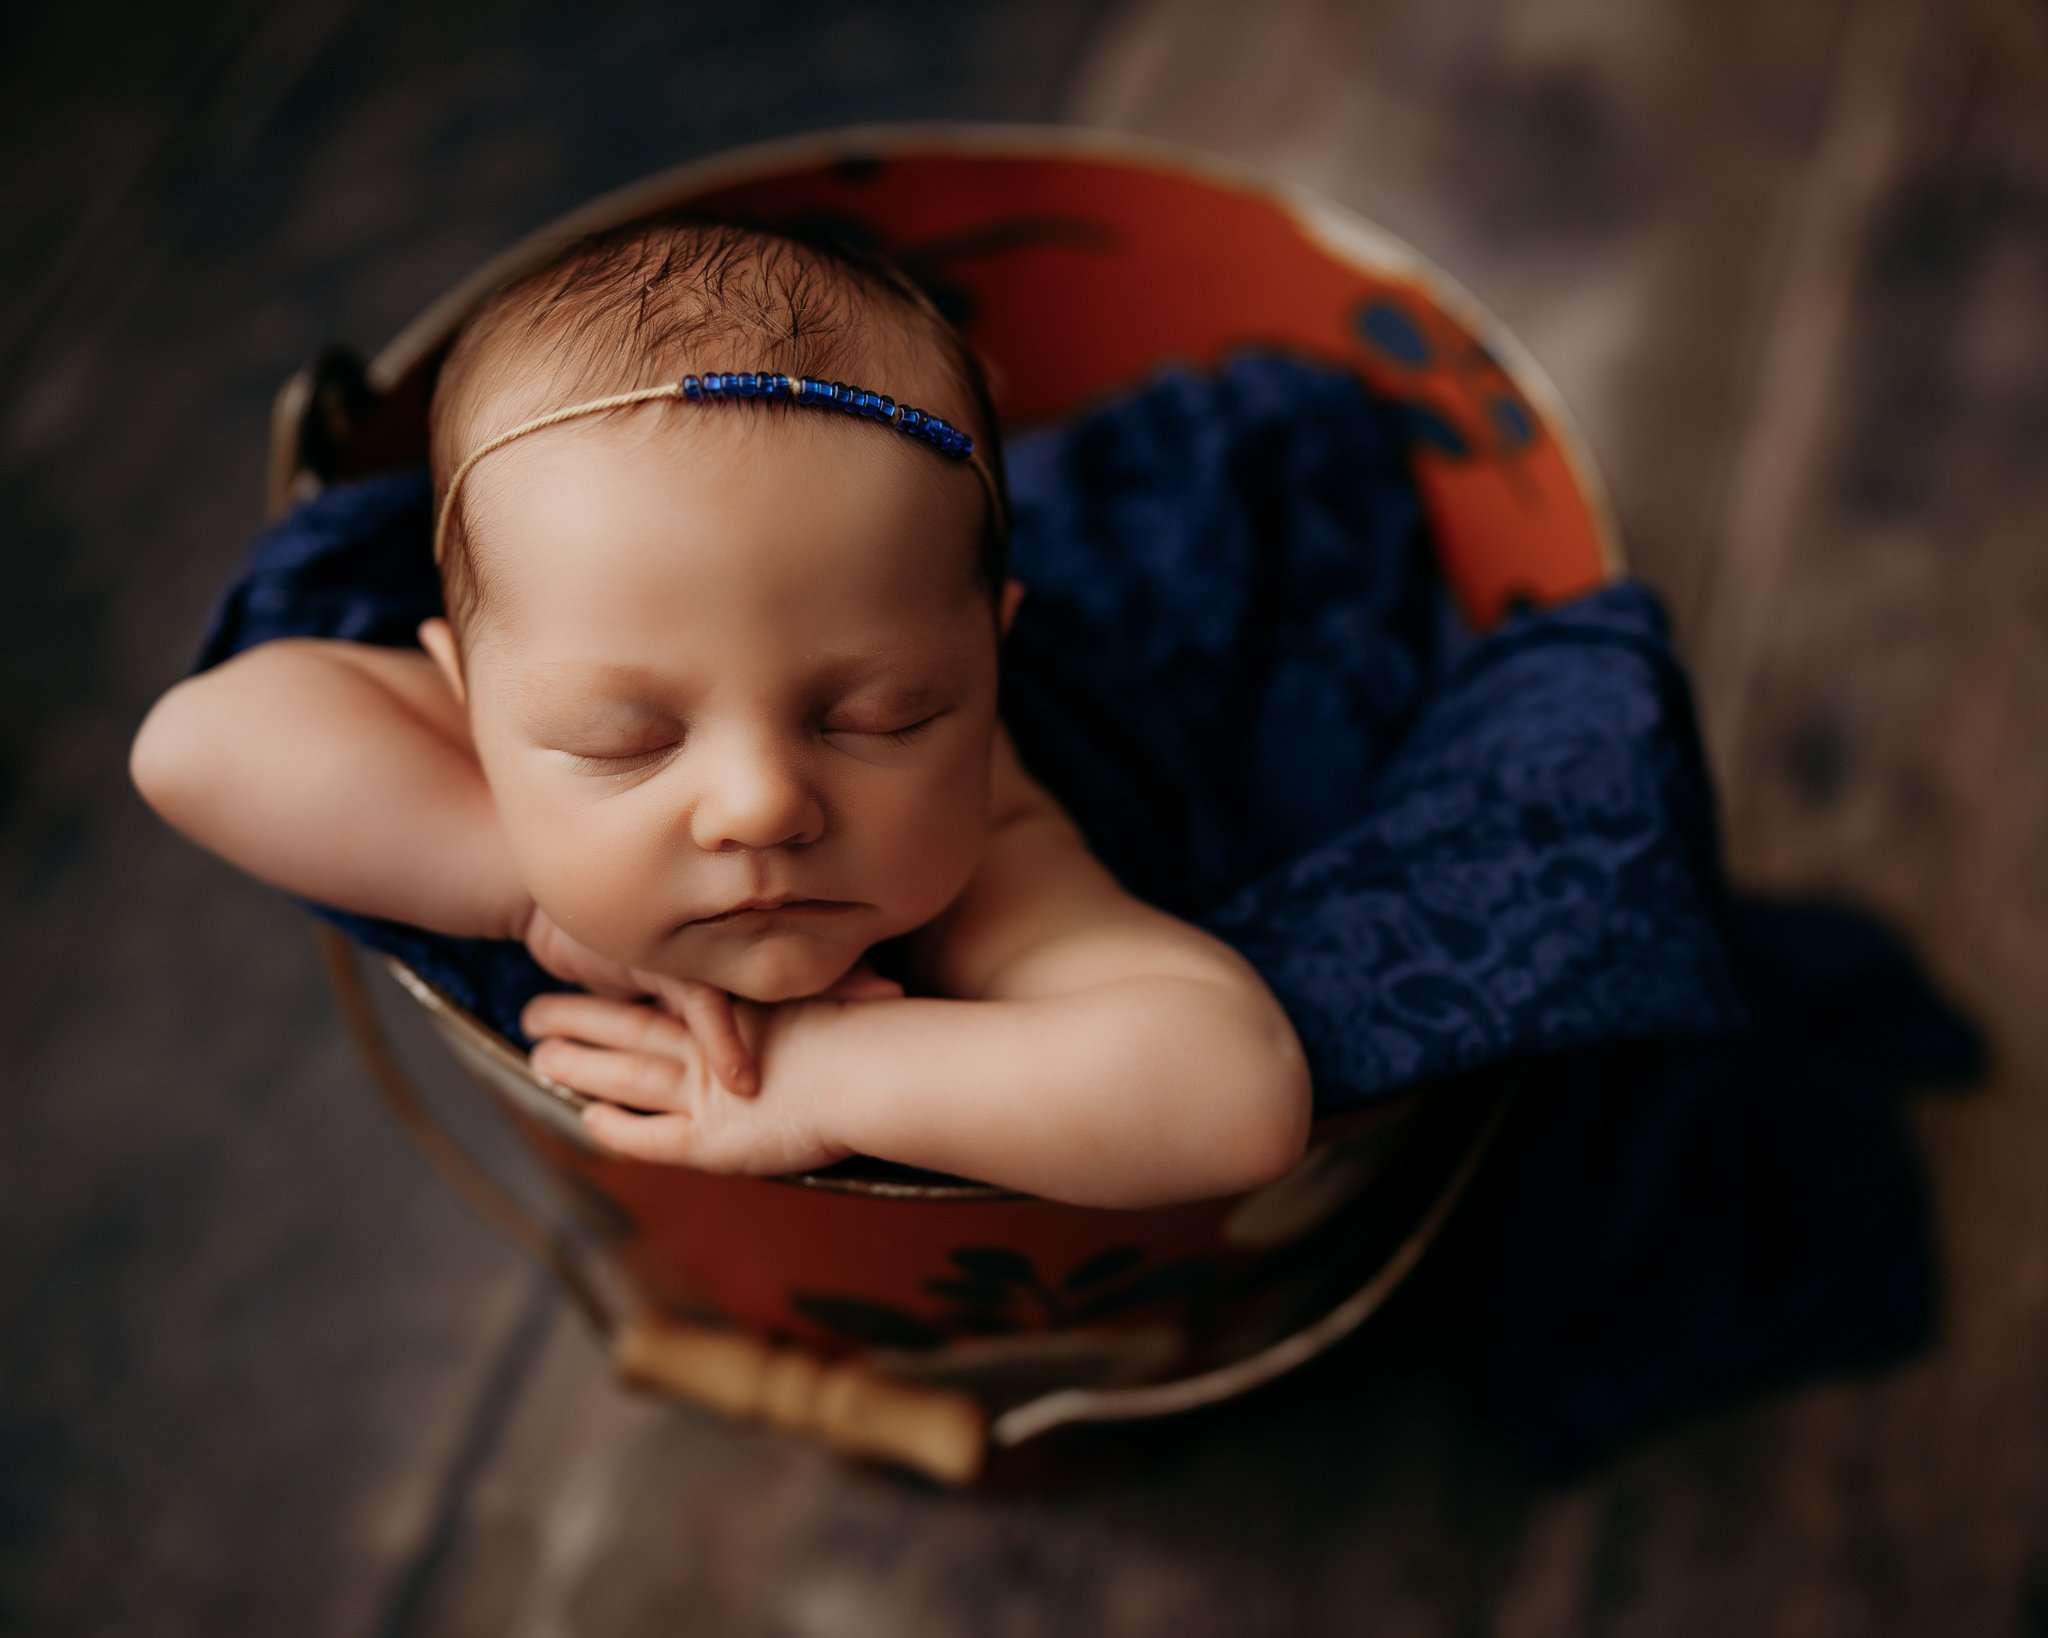 baby in bucket pose on dark wood floor with bucket being orange and navy floral